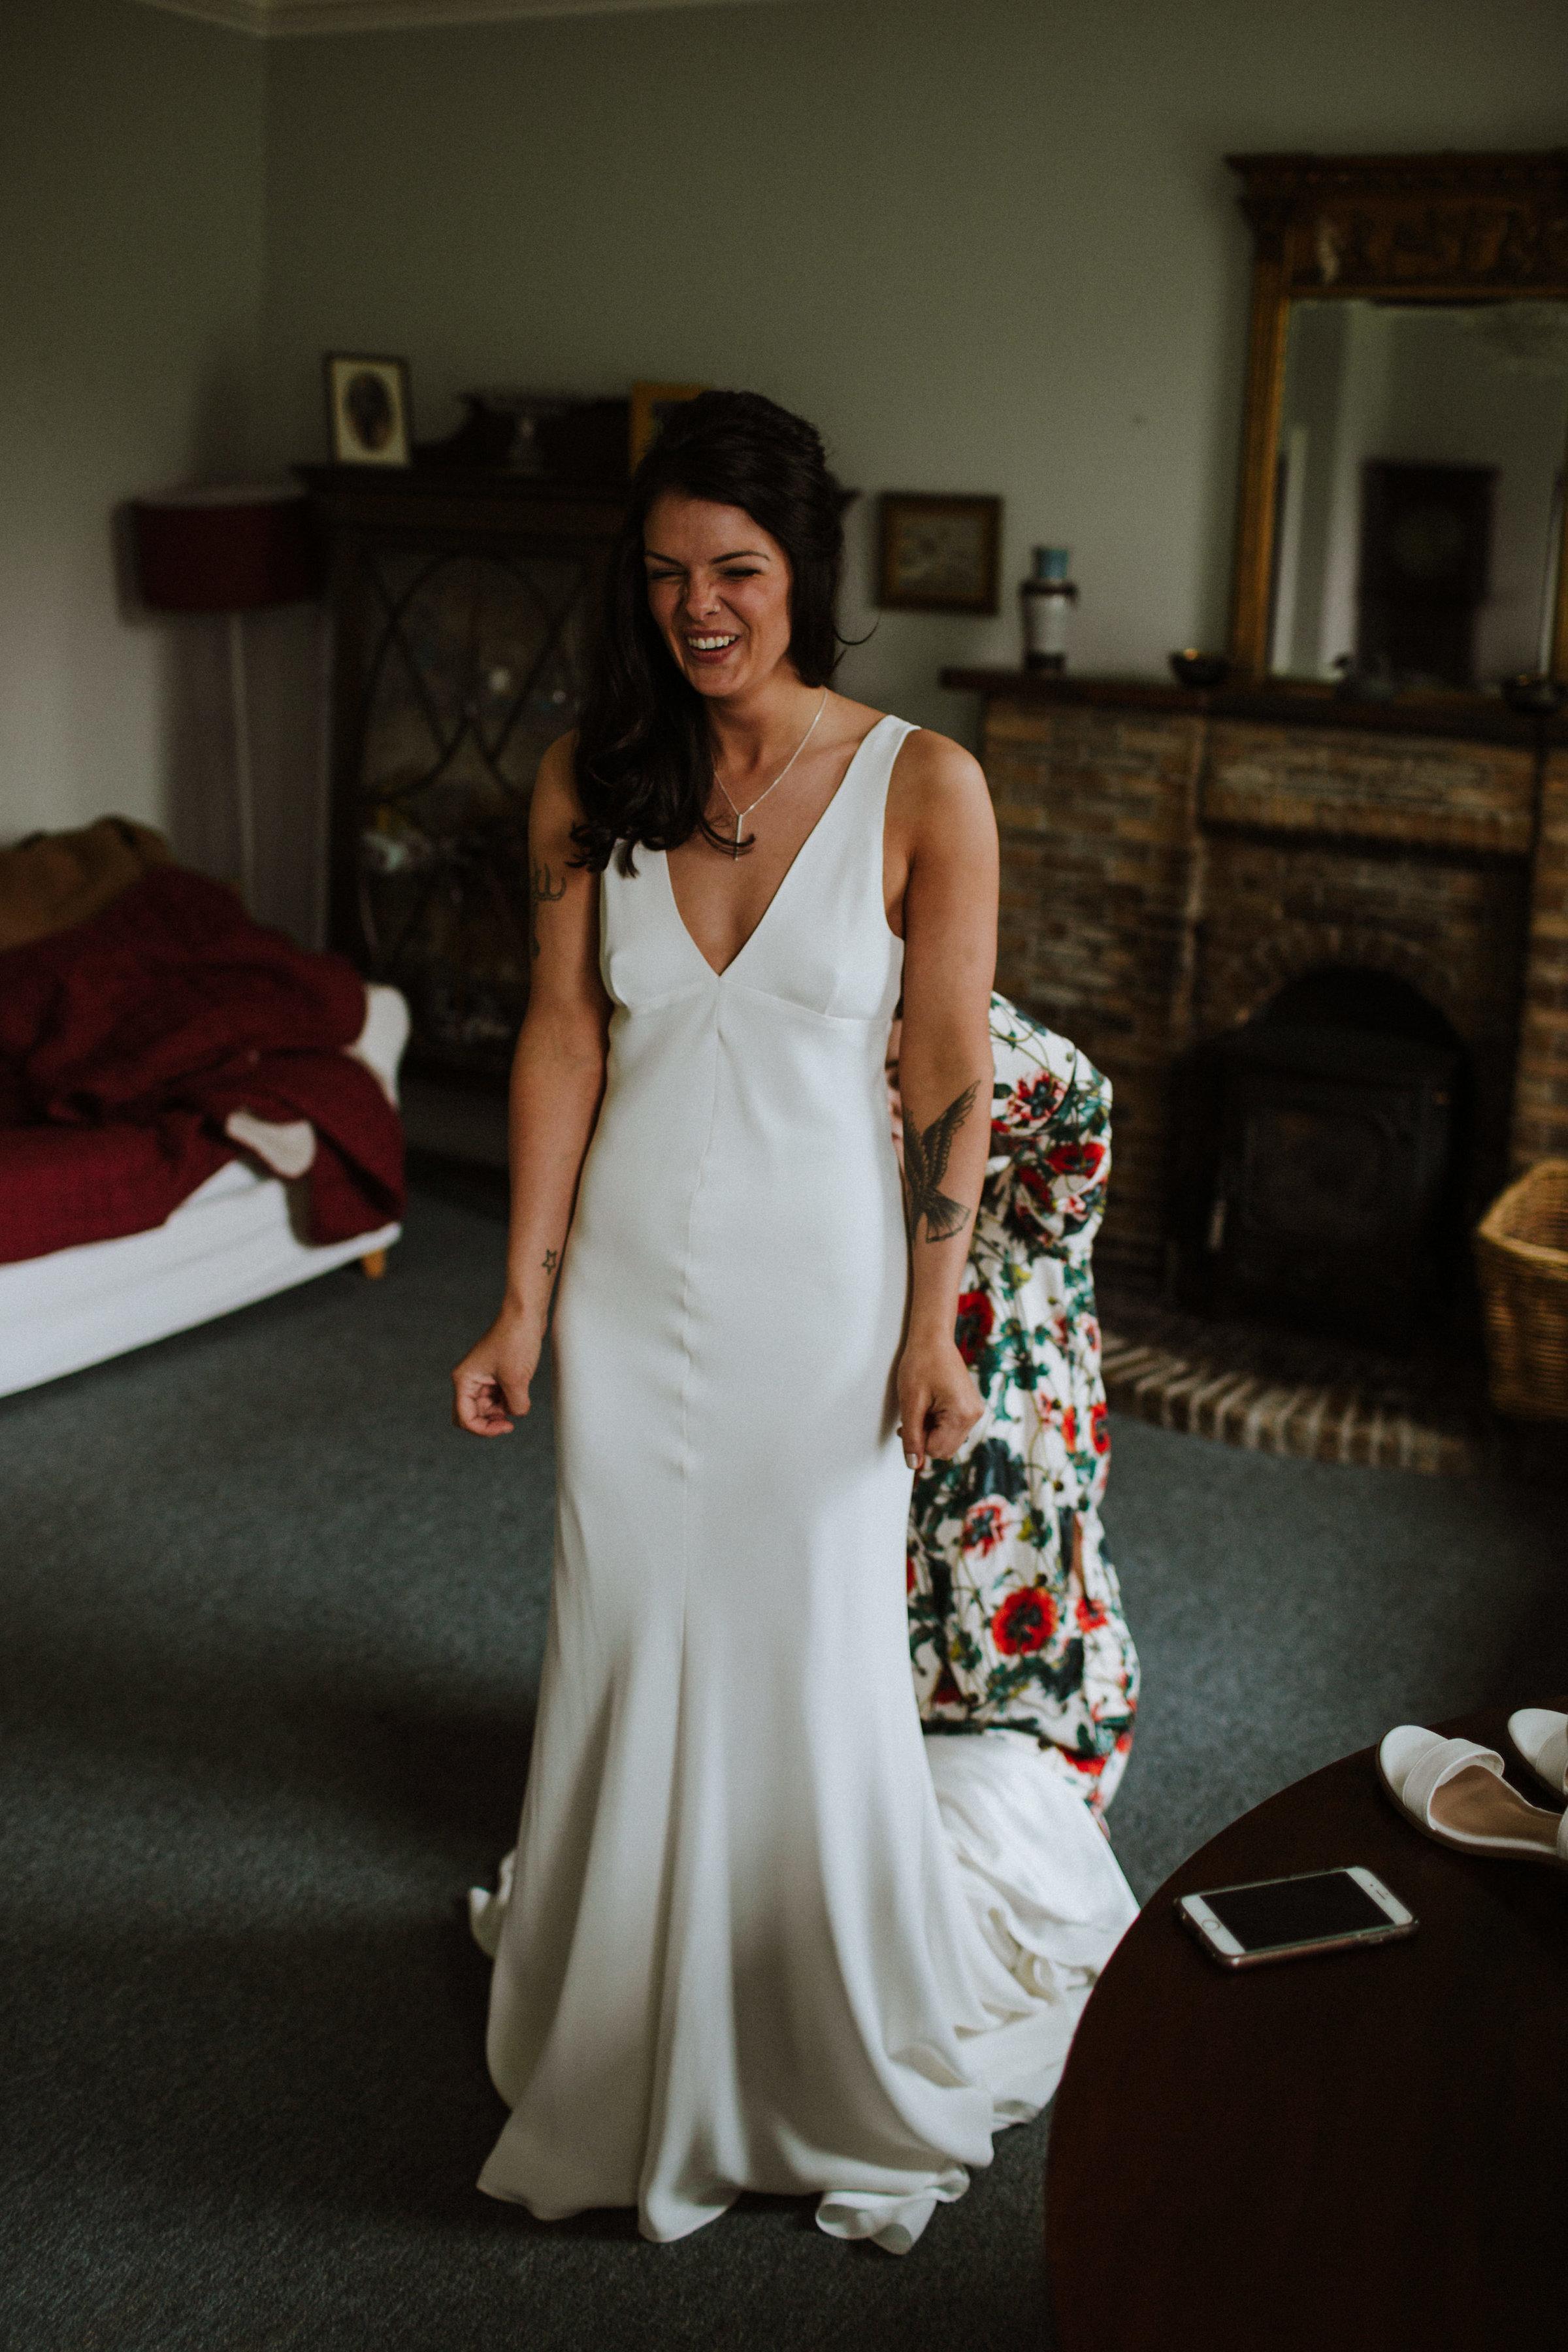 Katt-Scotland-Comrie-Crieff-Bias-Crepe-Wedding-Gown-Lace-Bridal-Biker-Jacket-Bespoke-Susanna-Greening-Derbyshire-6